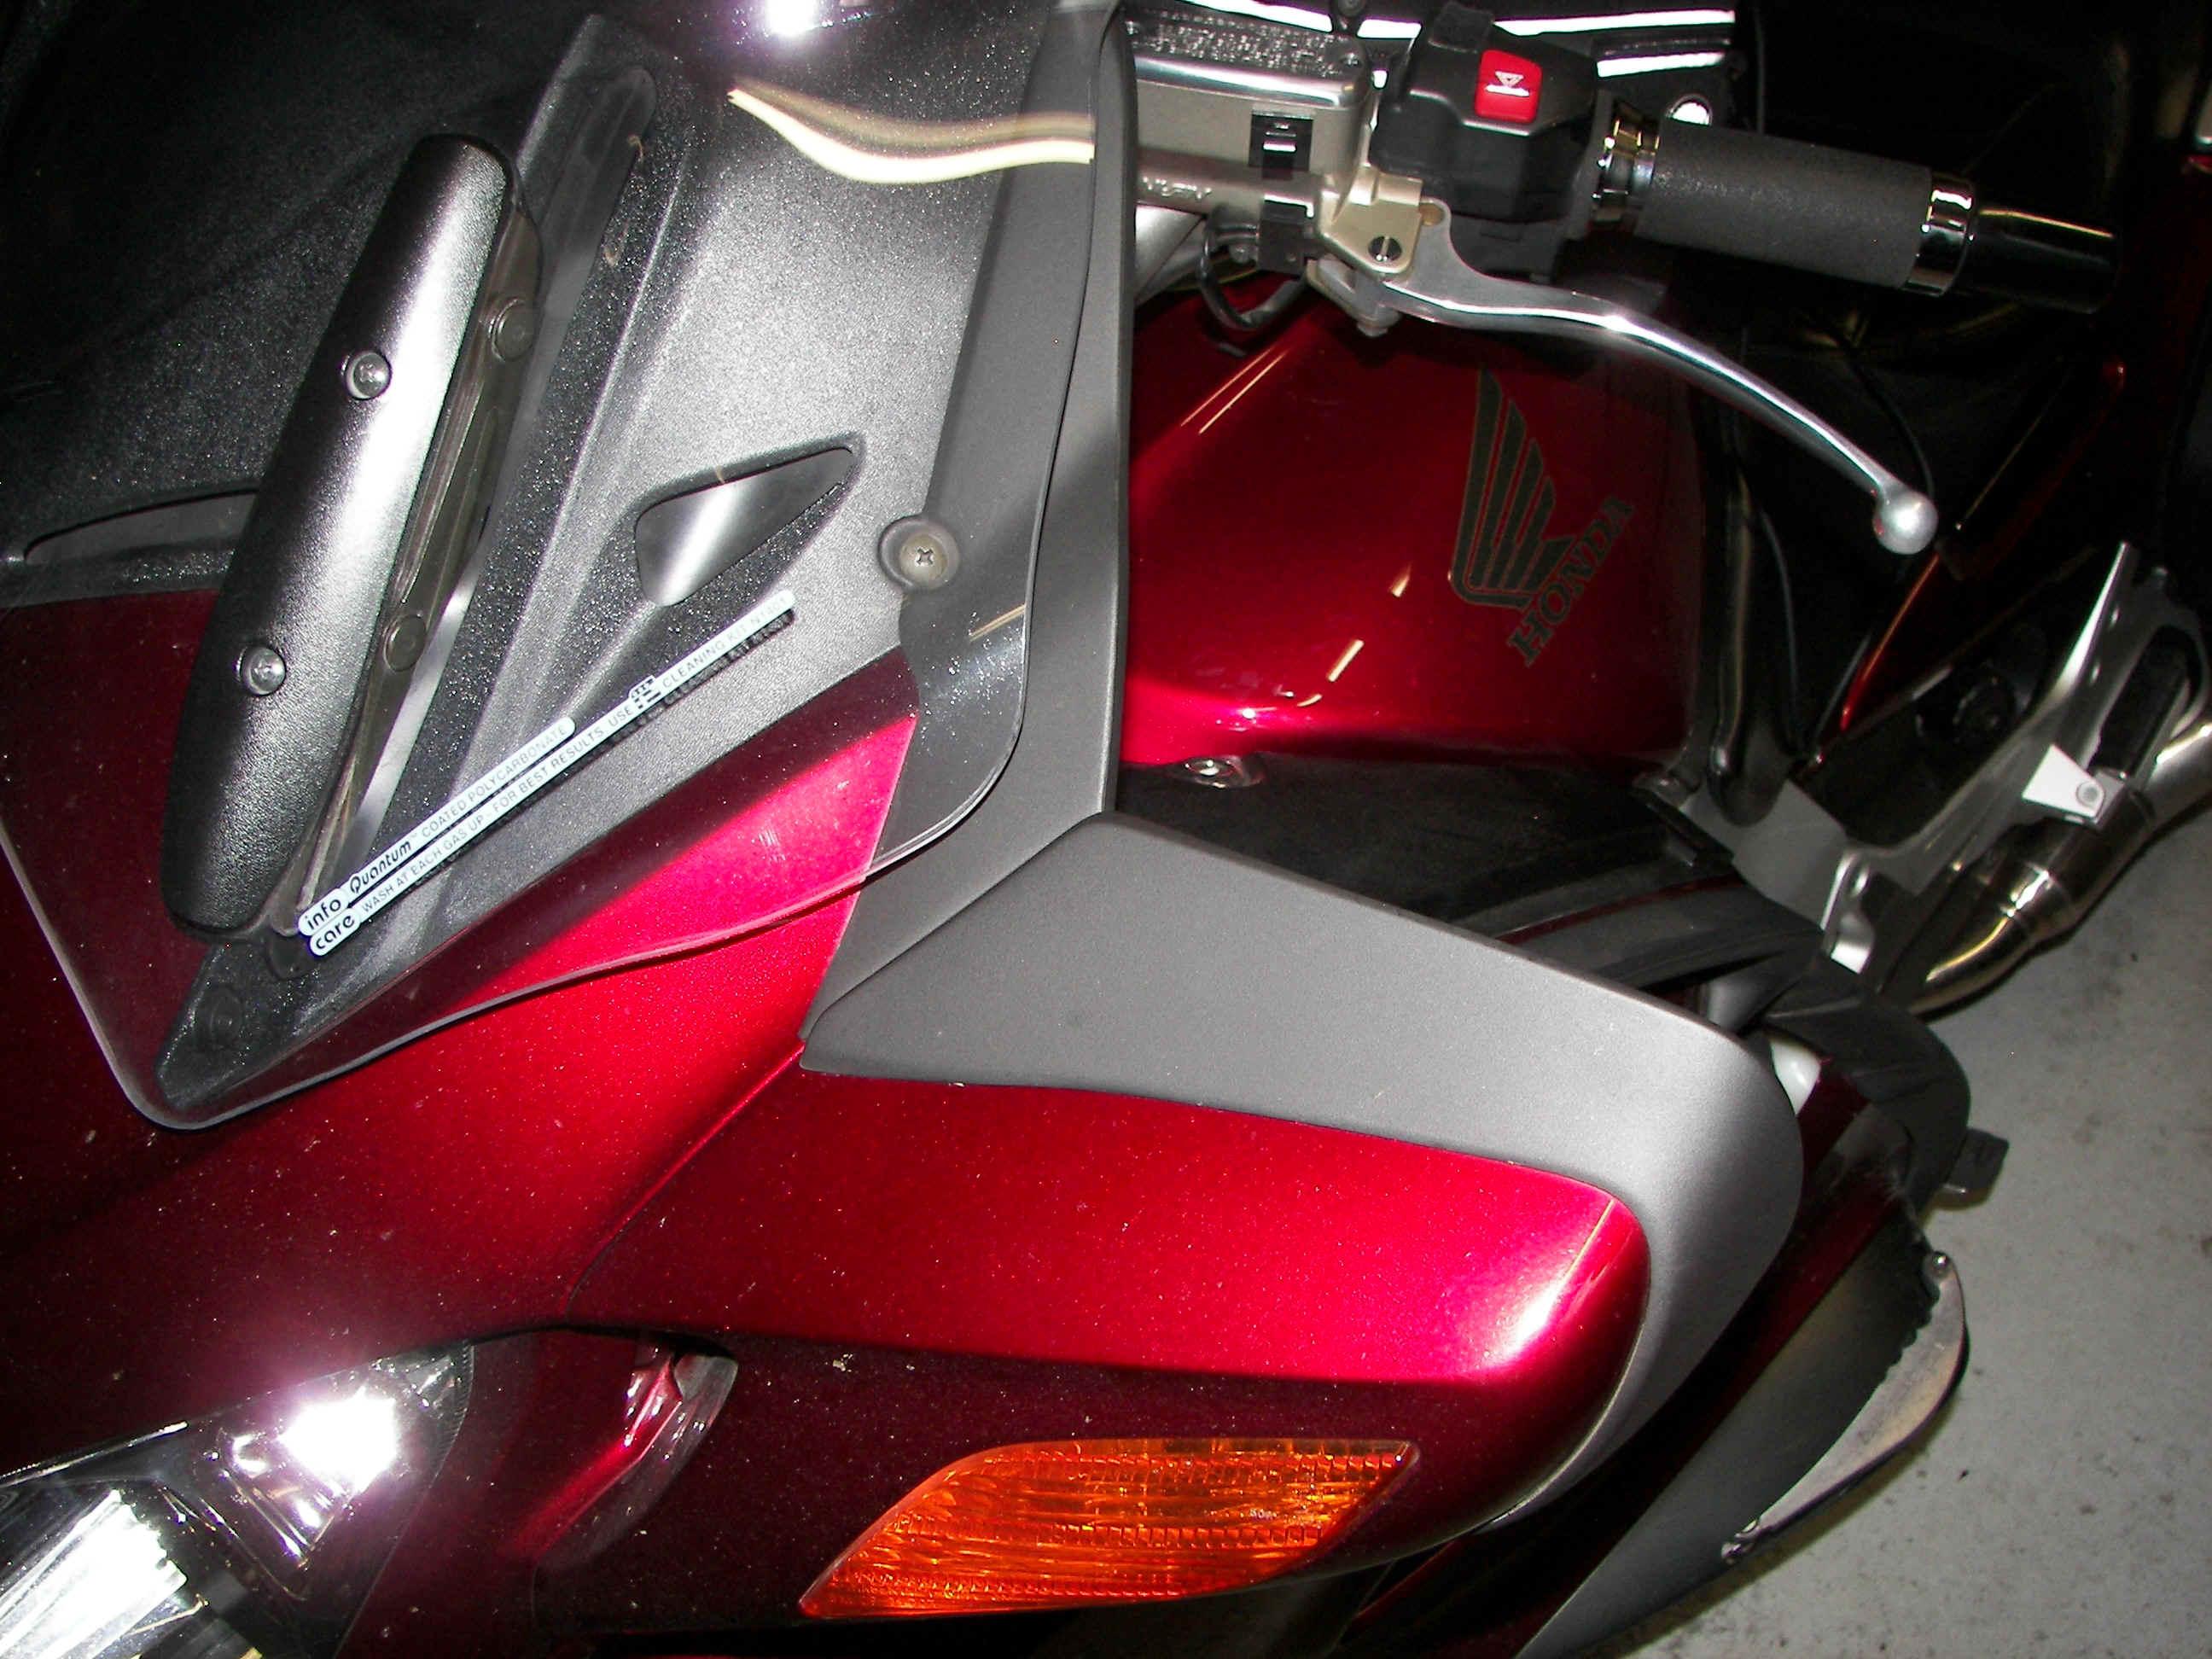 Honda St1300 Farkles